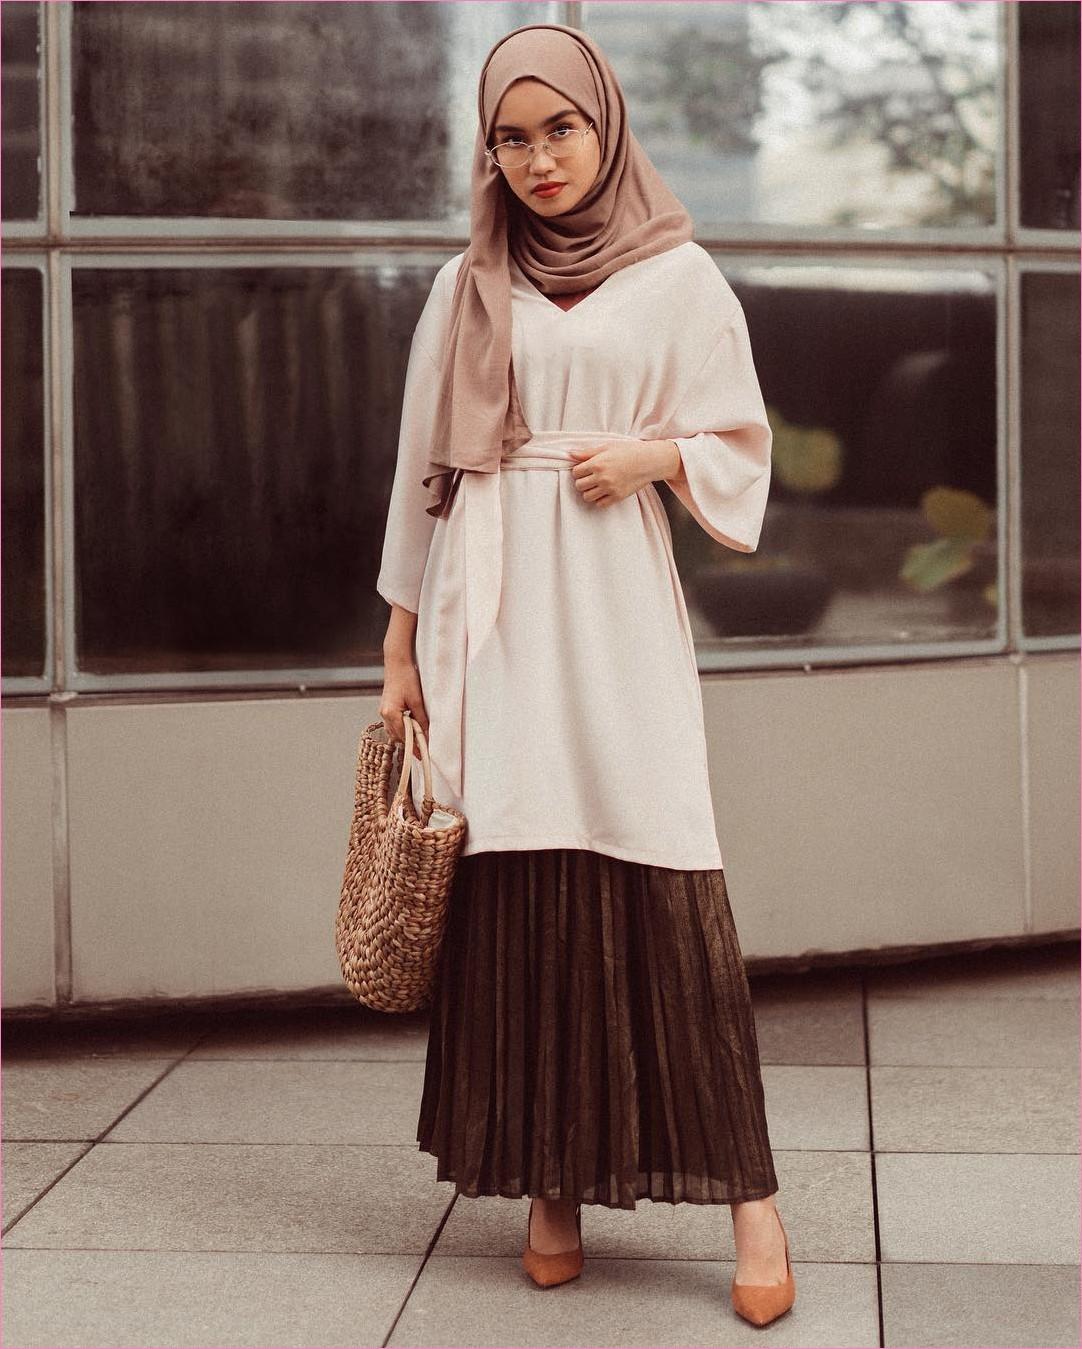 Outfit Rok Untuk Hijabers Ala Selebgram 2018 high heels wedges krem tua hijab pashmina diamond coklat blouse tunic krem muda handbags rotan krem kacamata bulat putih broomstick skirt coklat tua ootd trendy